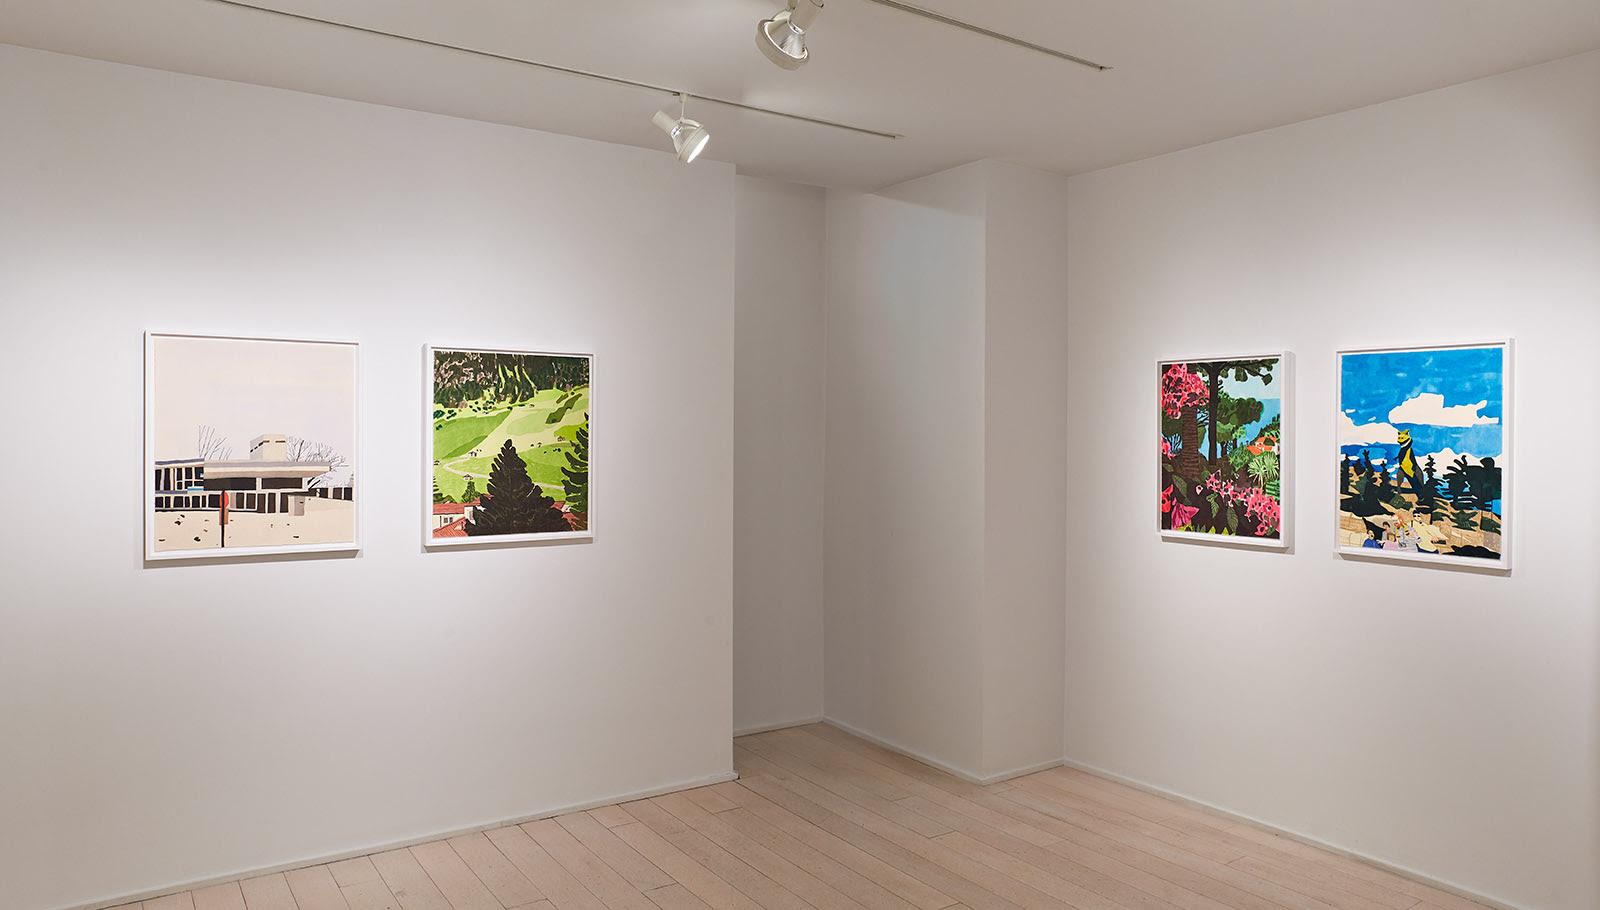 art exhibition of Jonas Wood Four Landscapes (2020) A set of four Ukiyo-e Japanese style woodcuts